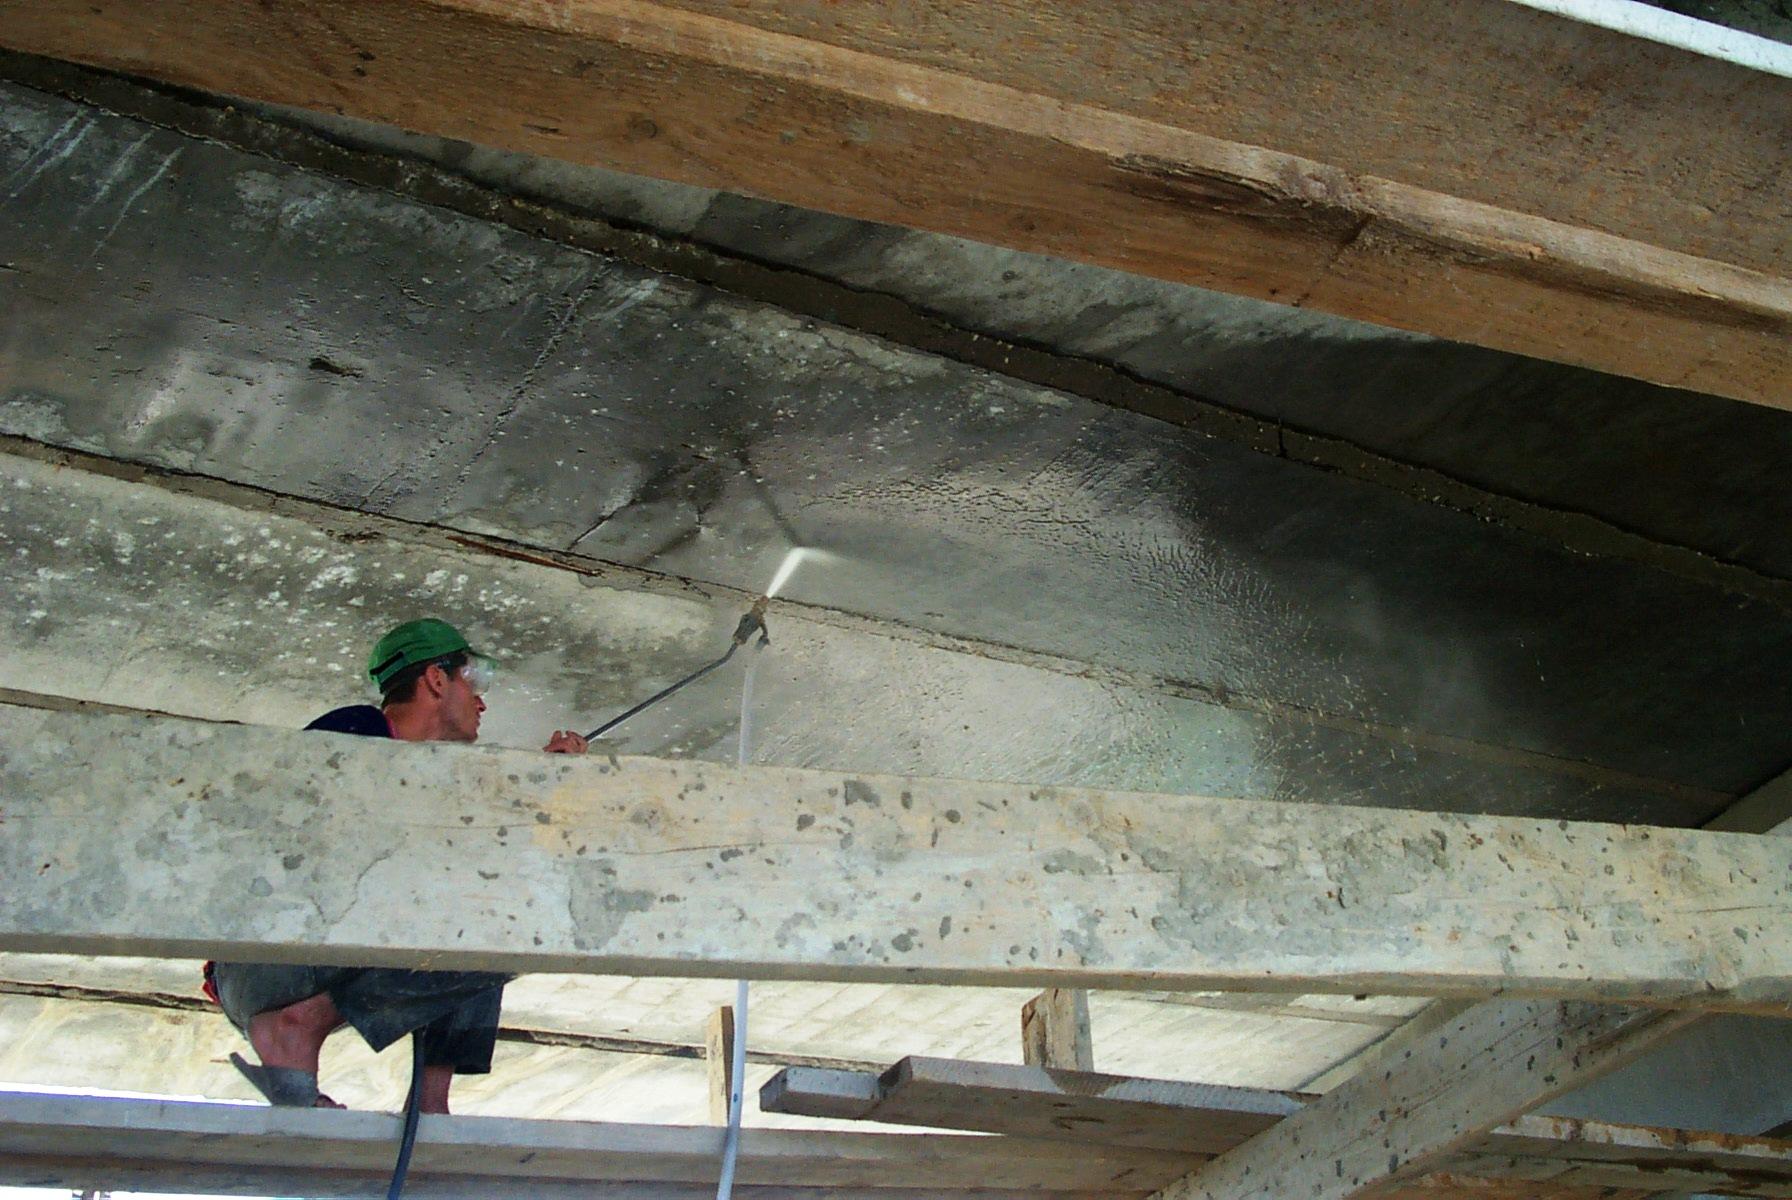 Reparatii pod (DN2), Km. 33 - 028, peste raul Calnistea MAPEI - Poza 5